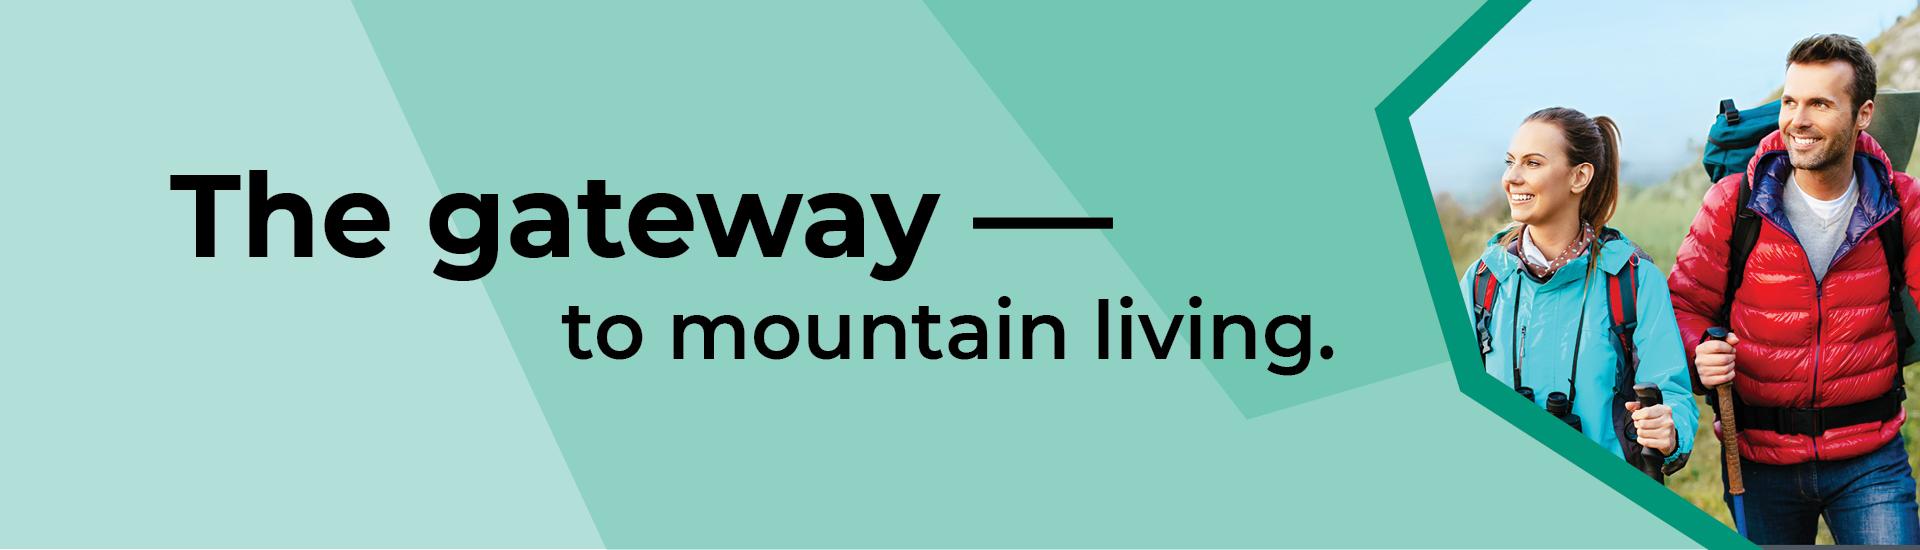 gateway-experience-mountain-hero1